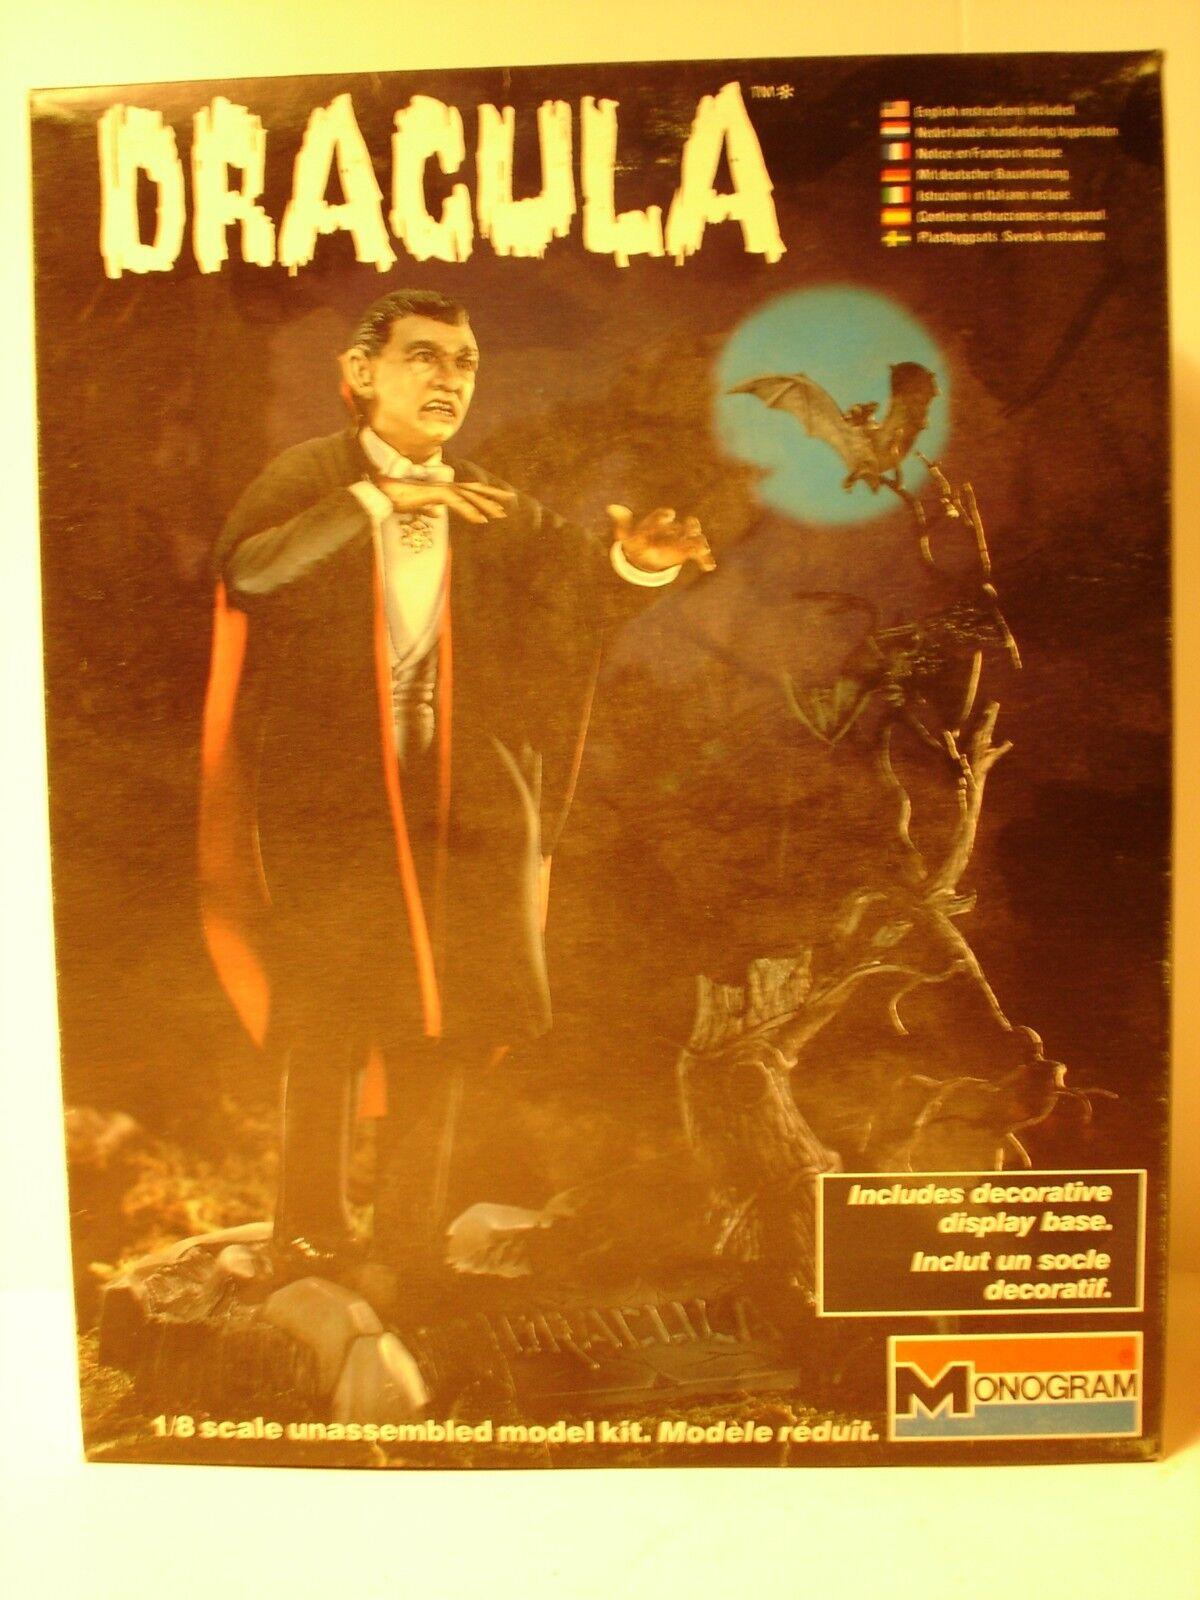 1991 Monogram 1 8 Scale,  Dracula . Model